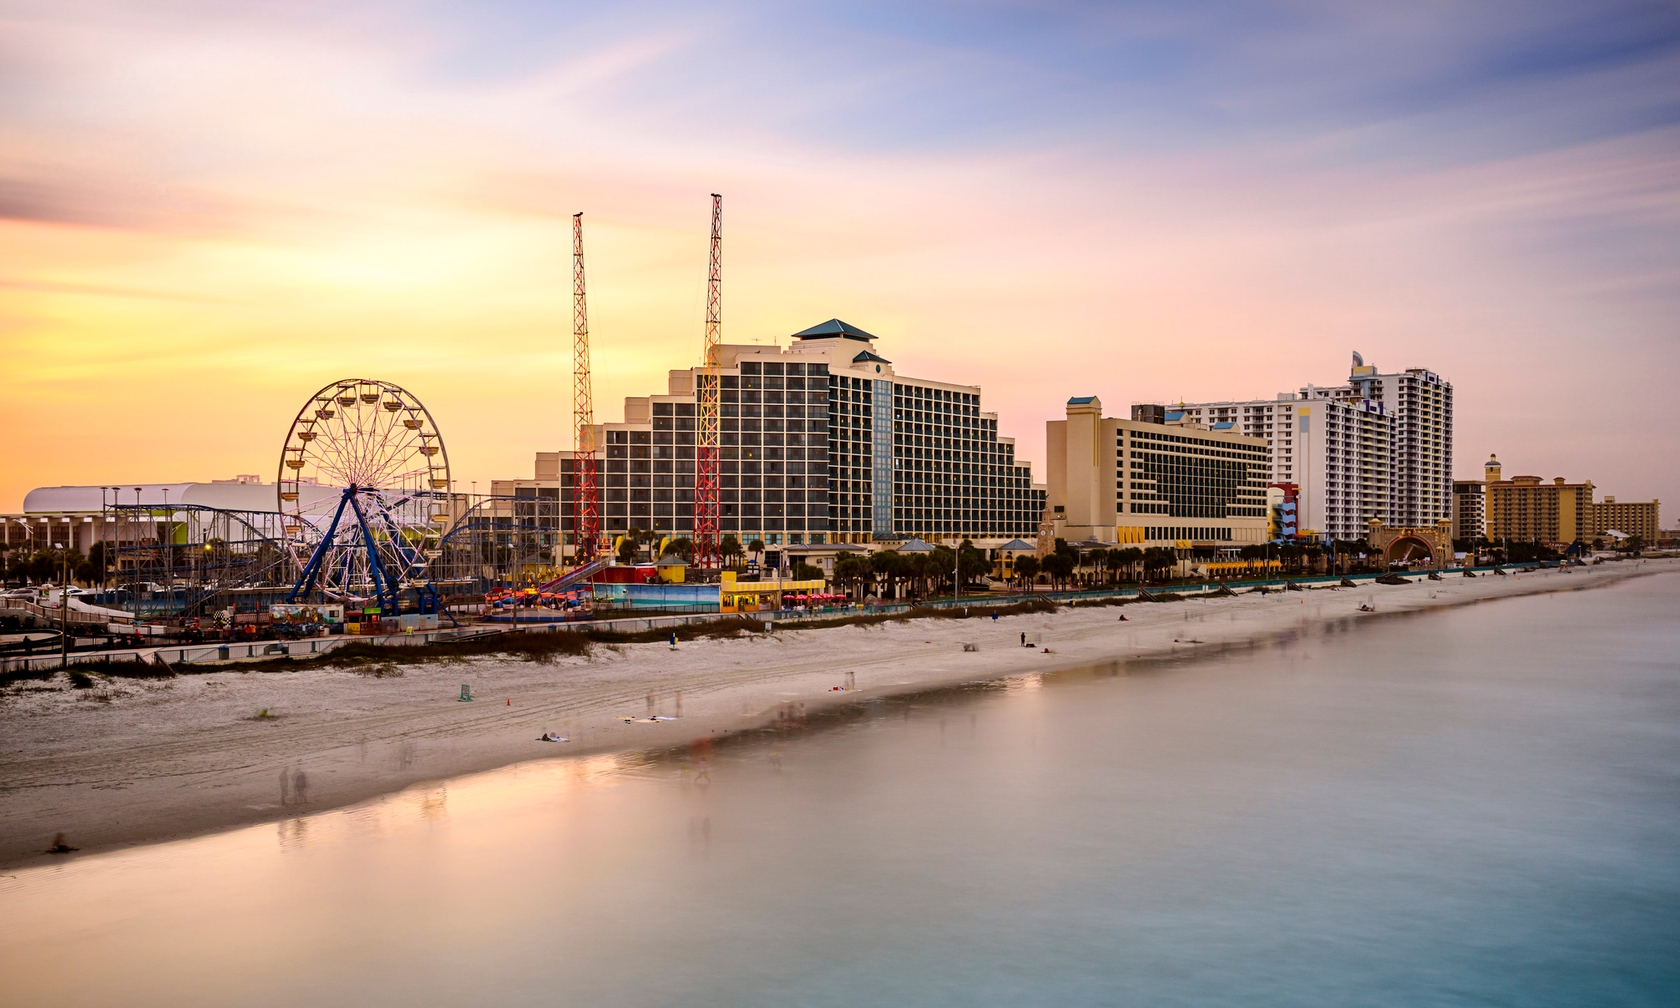 Vacation rentals in Daytona Beach